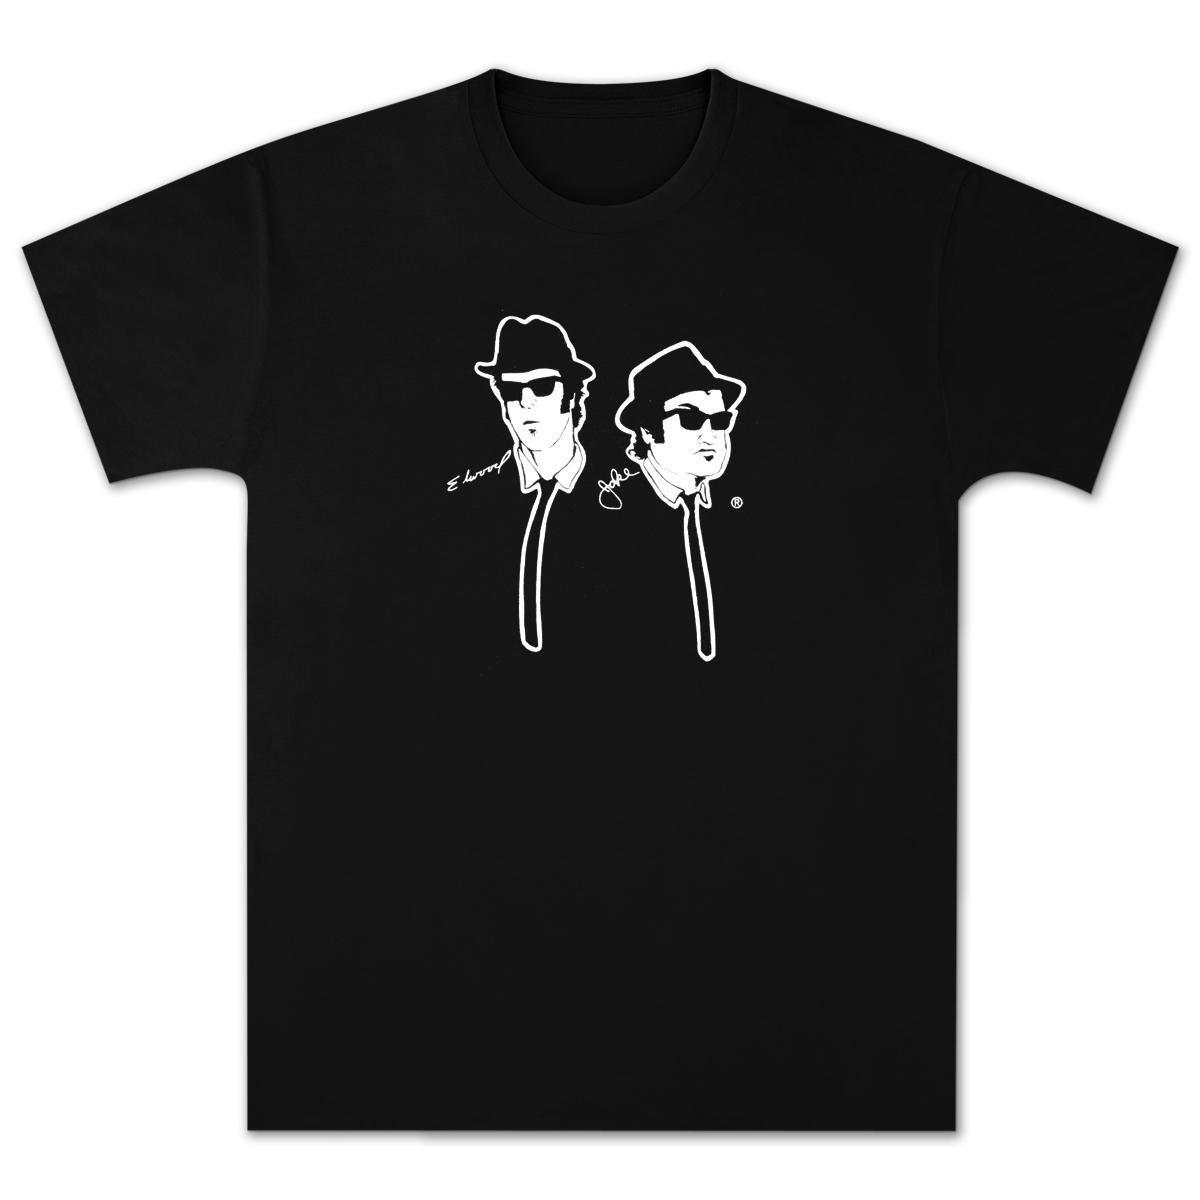 House of Blues Black J&E T-Shirt - New Orleans